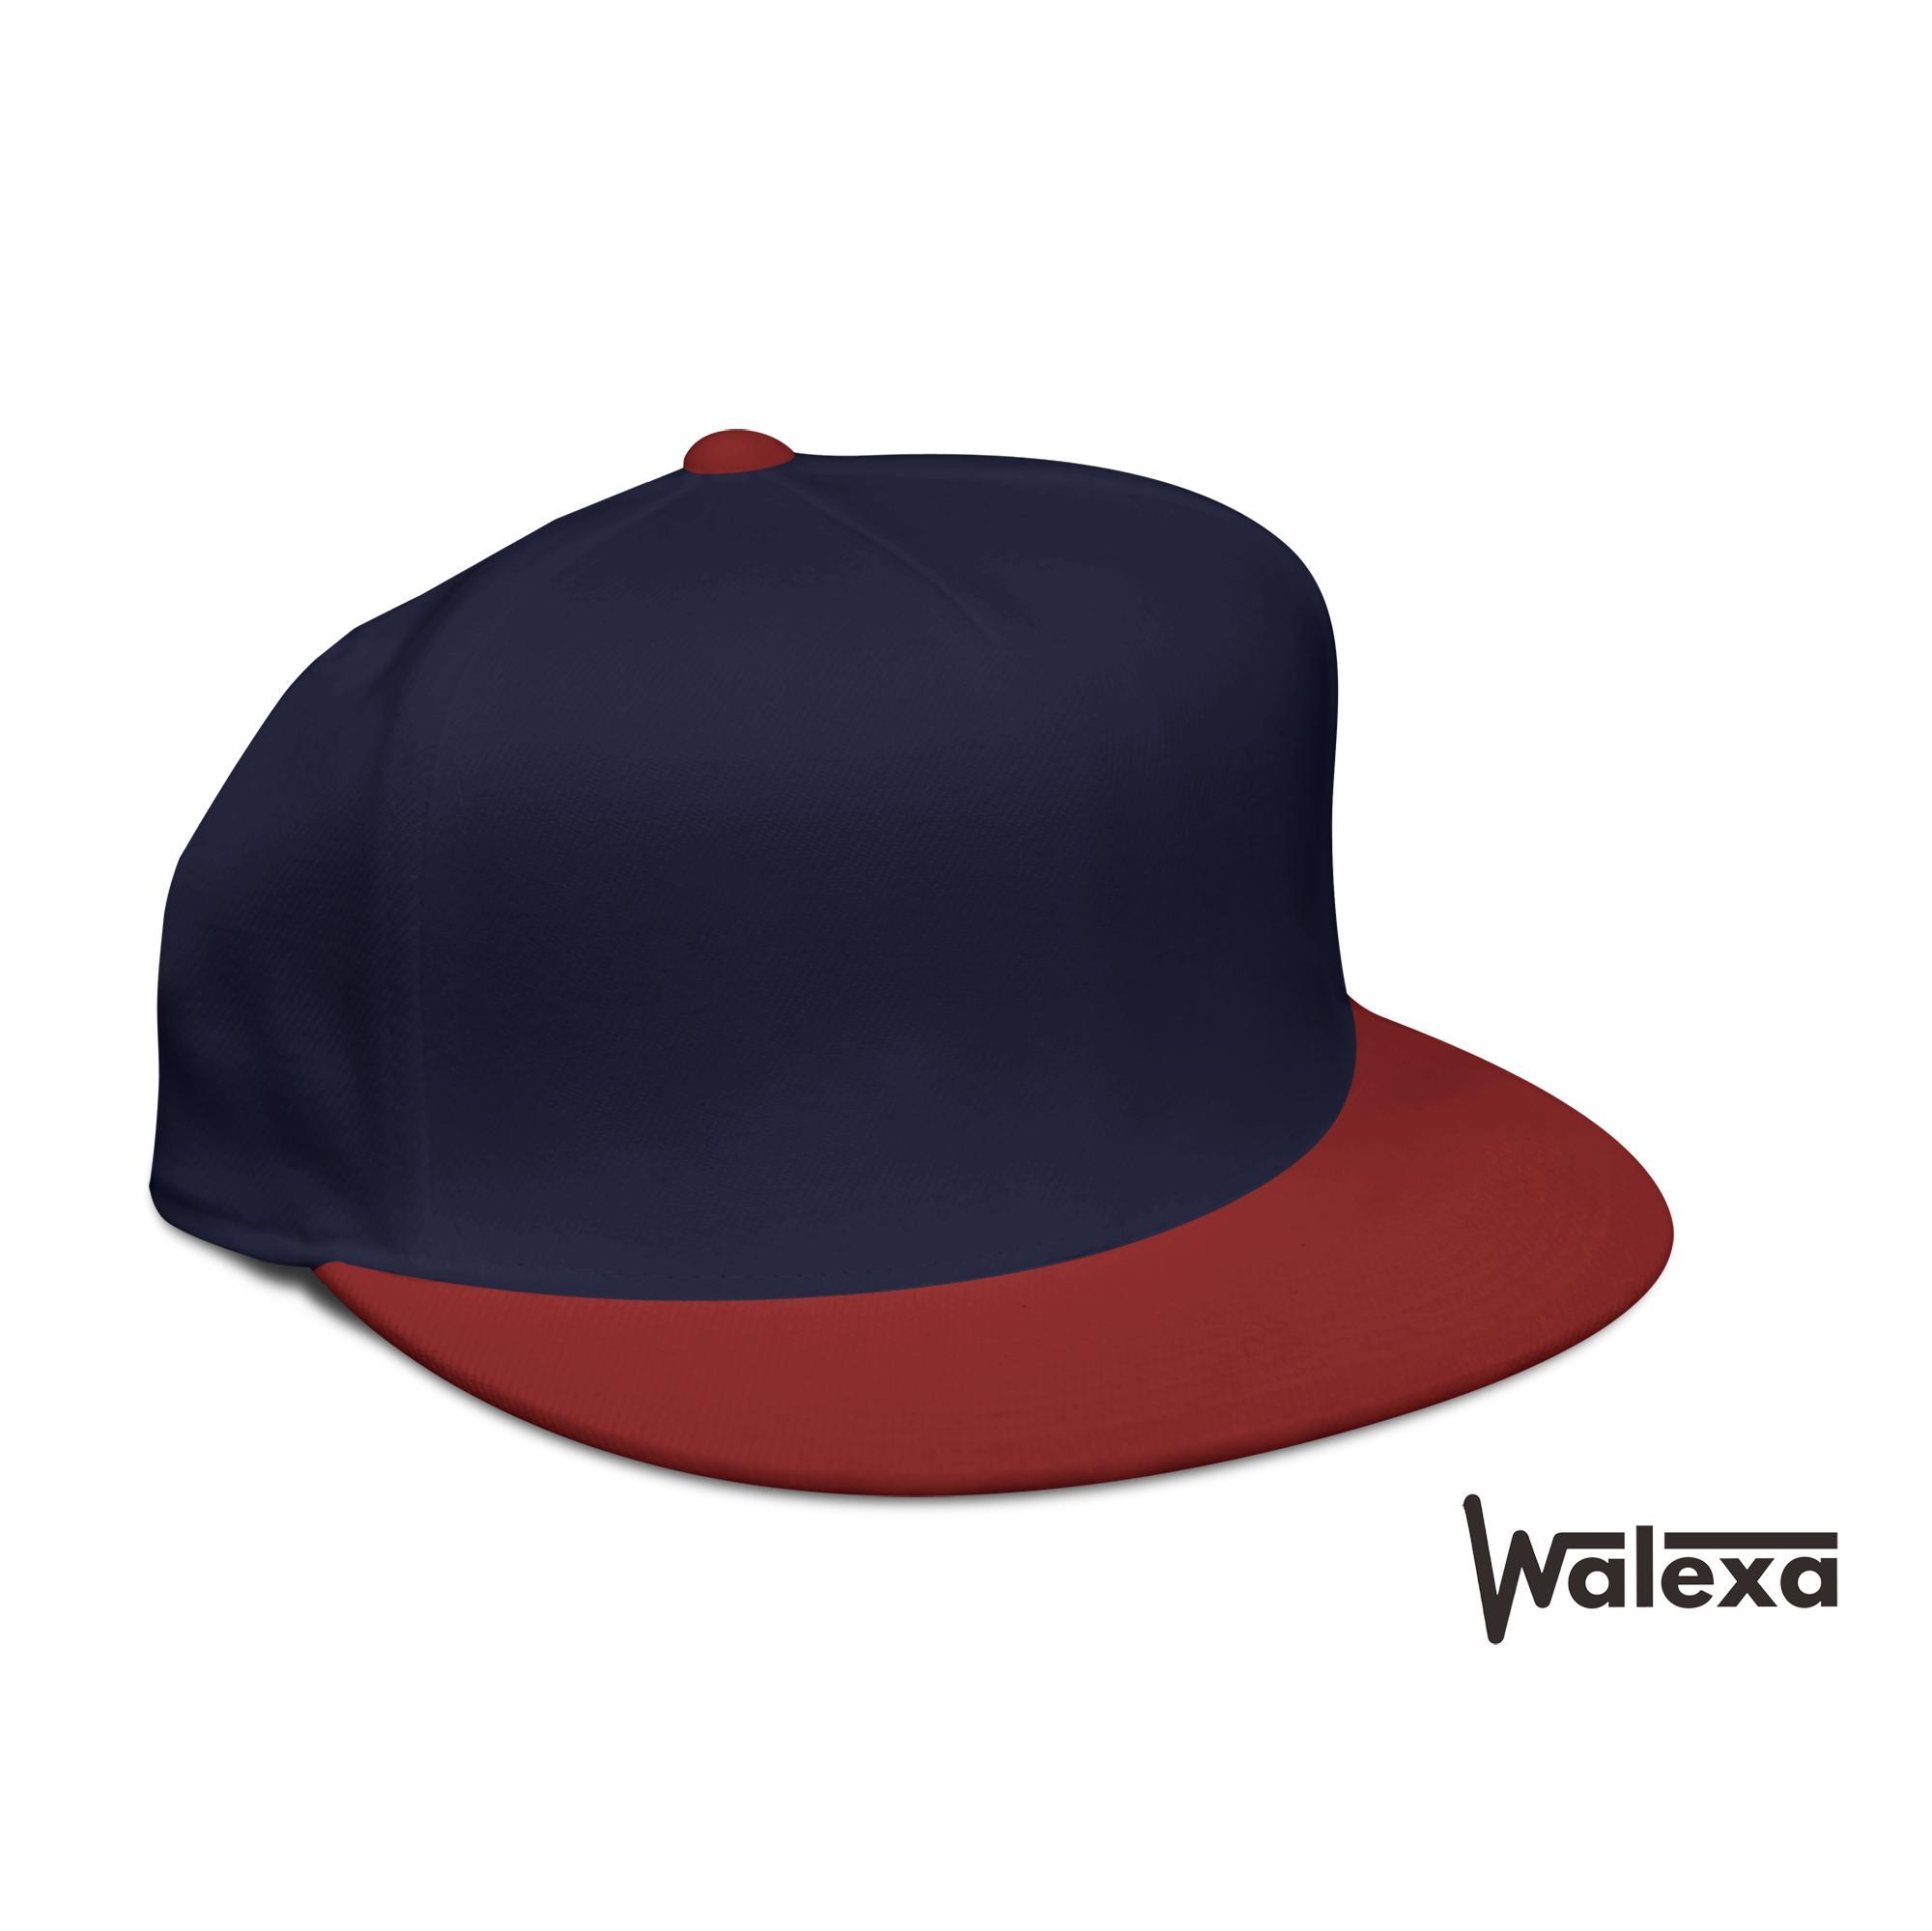 Walexa - Topi Snapback Hiphop By Walexa--.